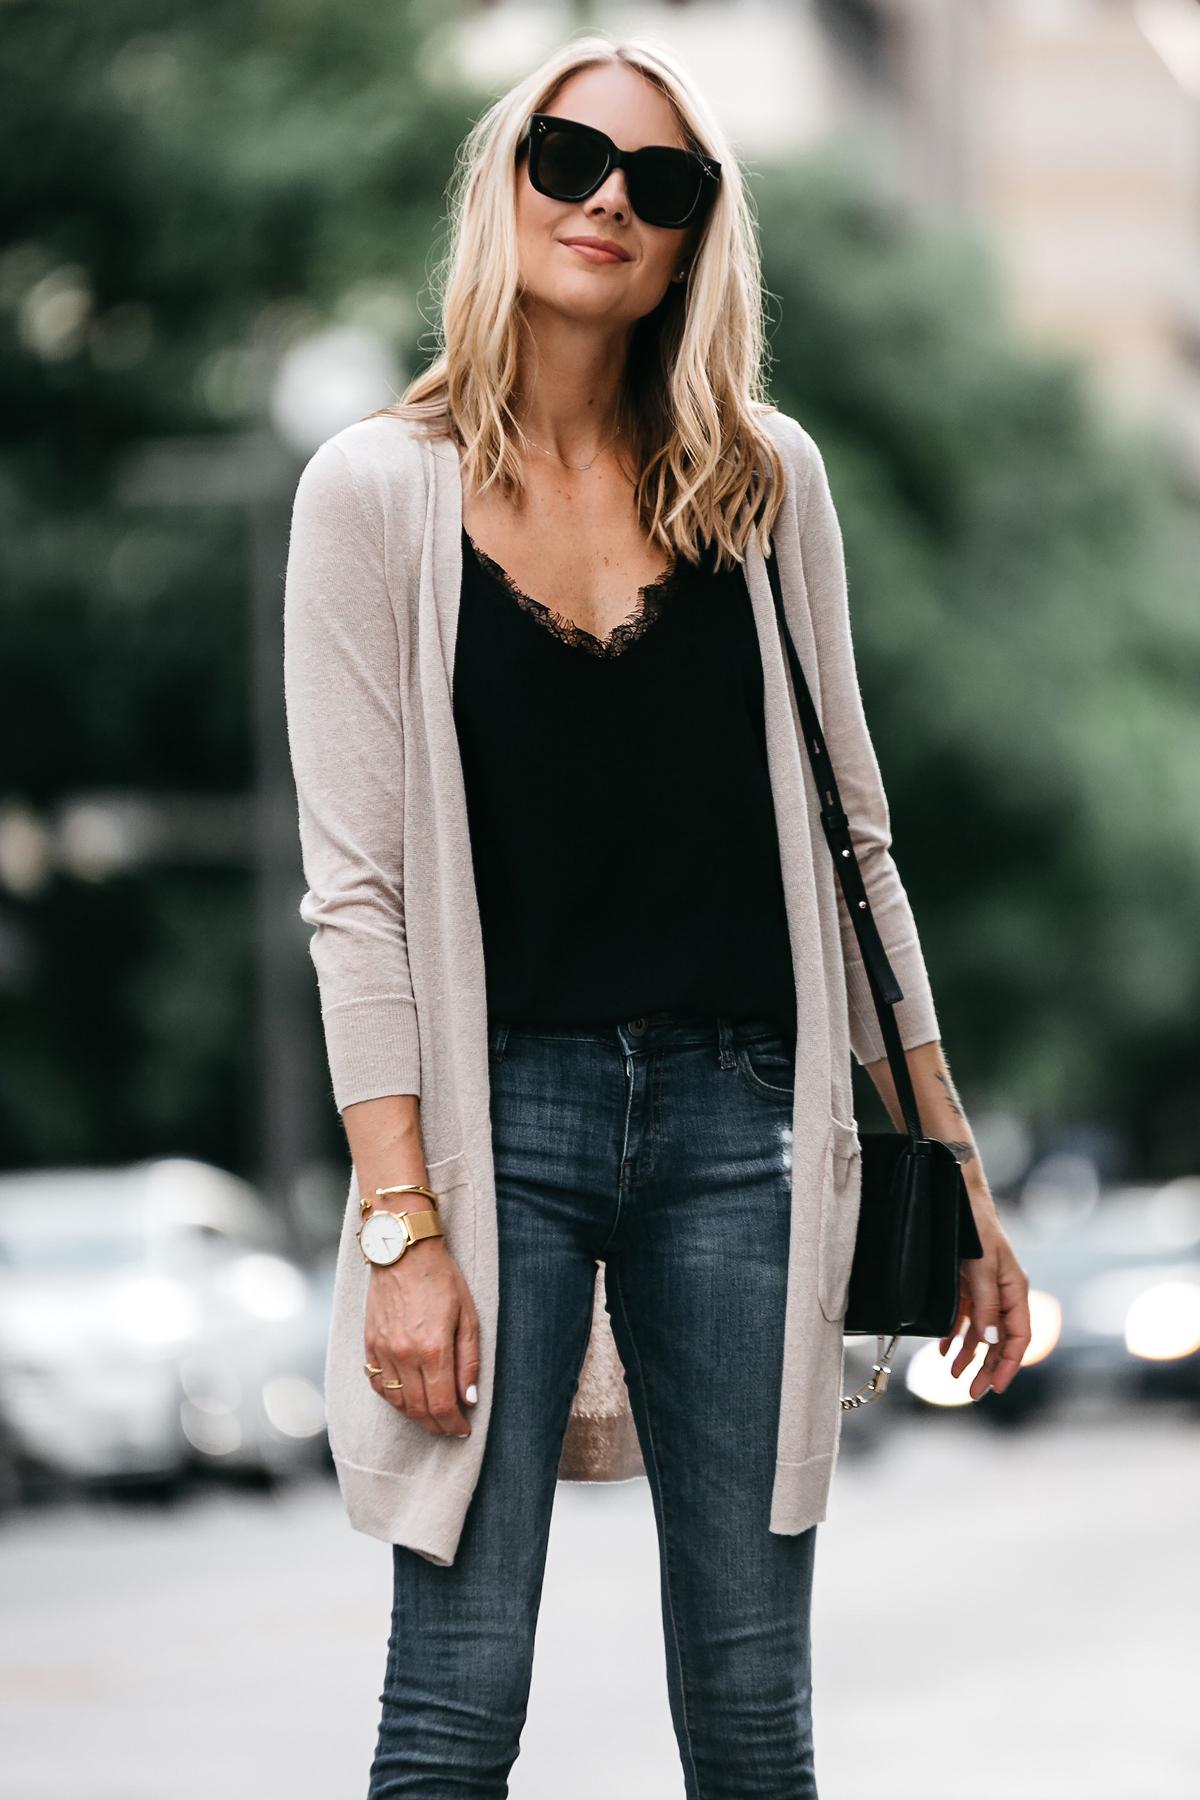 Blonde Woman Wearing Long Tan Cardigan Black Lace Cami Denim Skinny Jeans Outfit Fashion Jackson Dallas Blogger Fashion Blogger